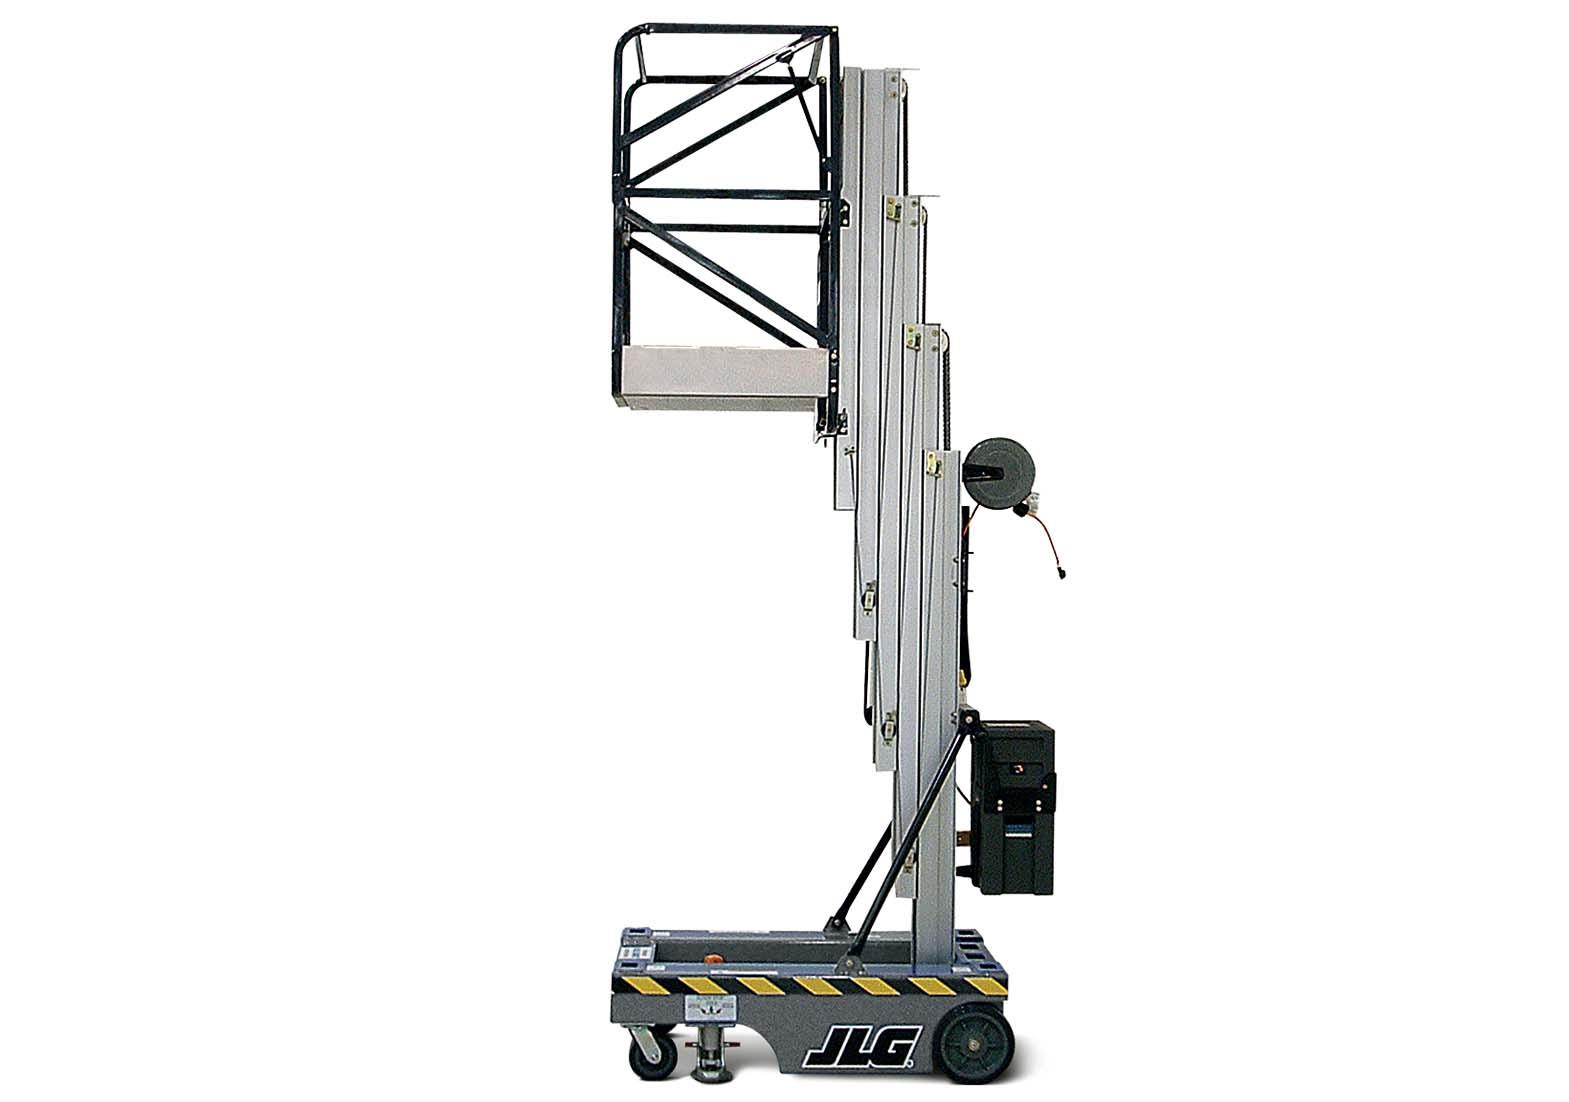 Jlg Ami Series Push Around Vertical Lifts